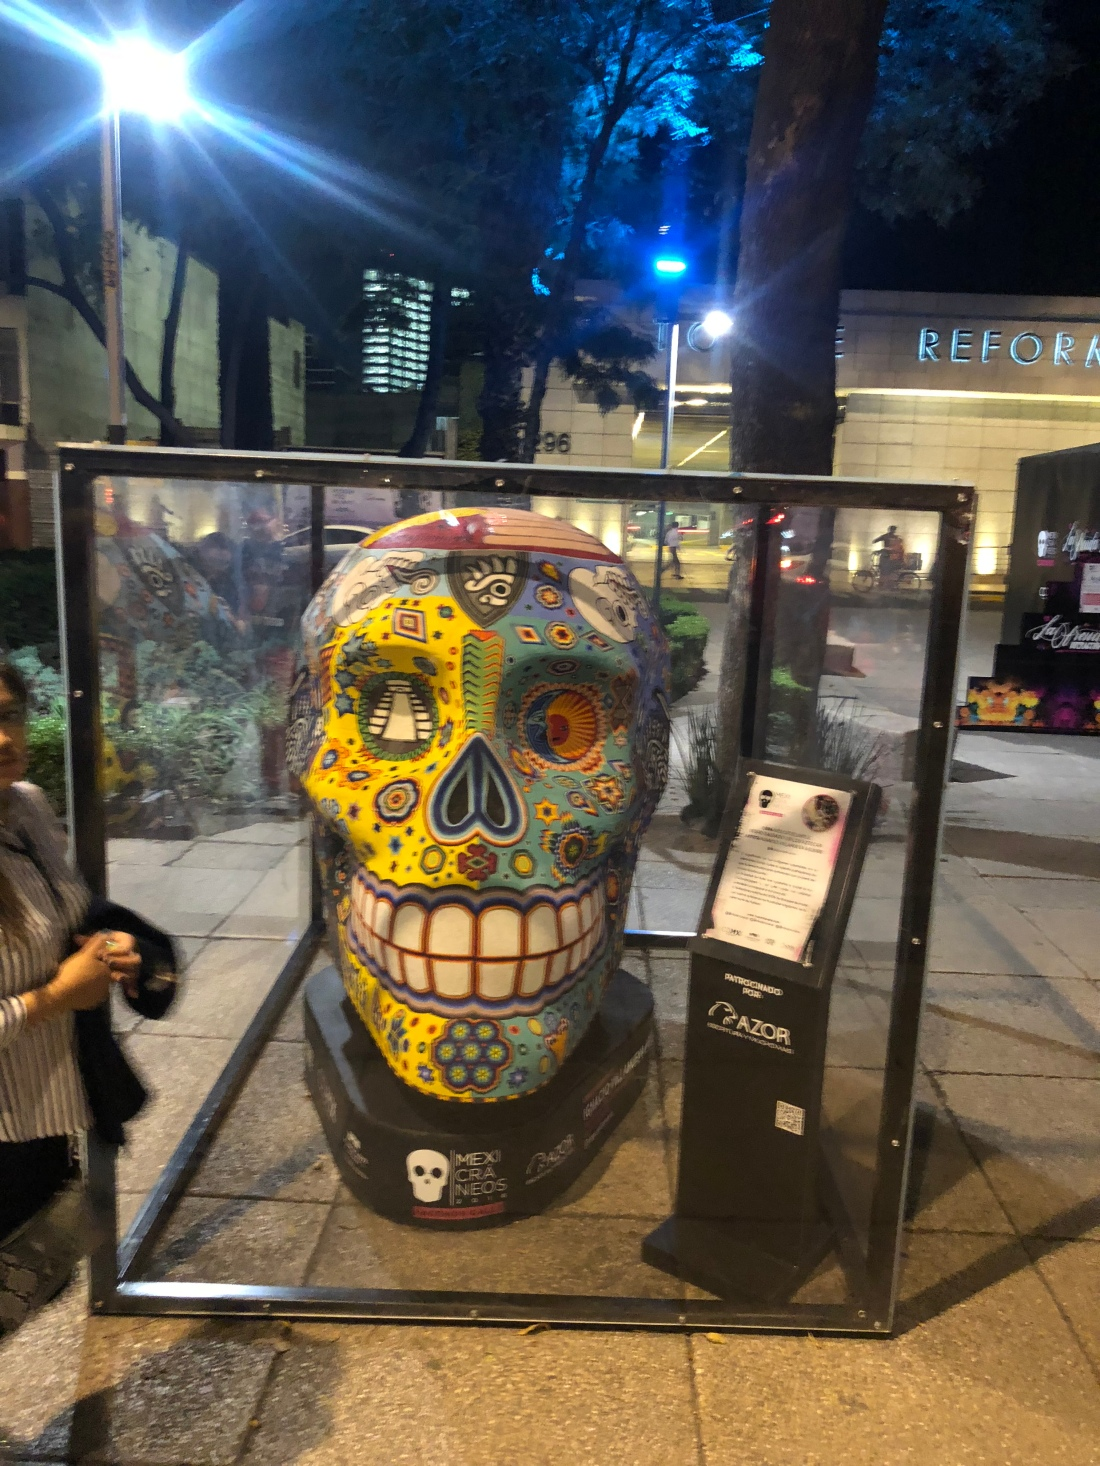 Ilham Animasi Coco Mewarnai Mexico City – Blog Travelling